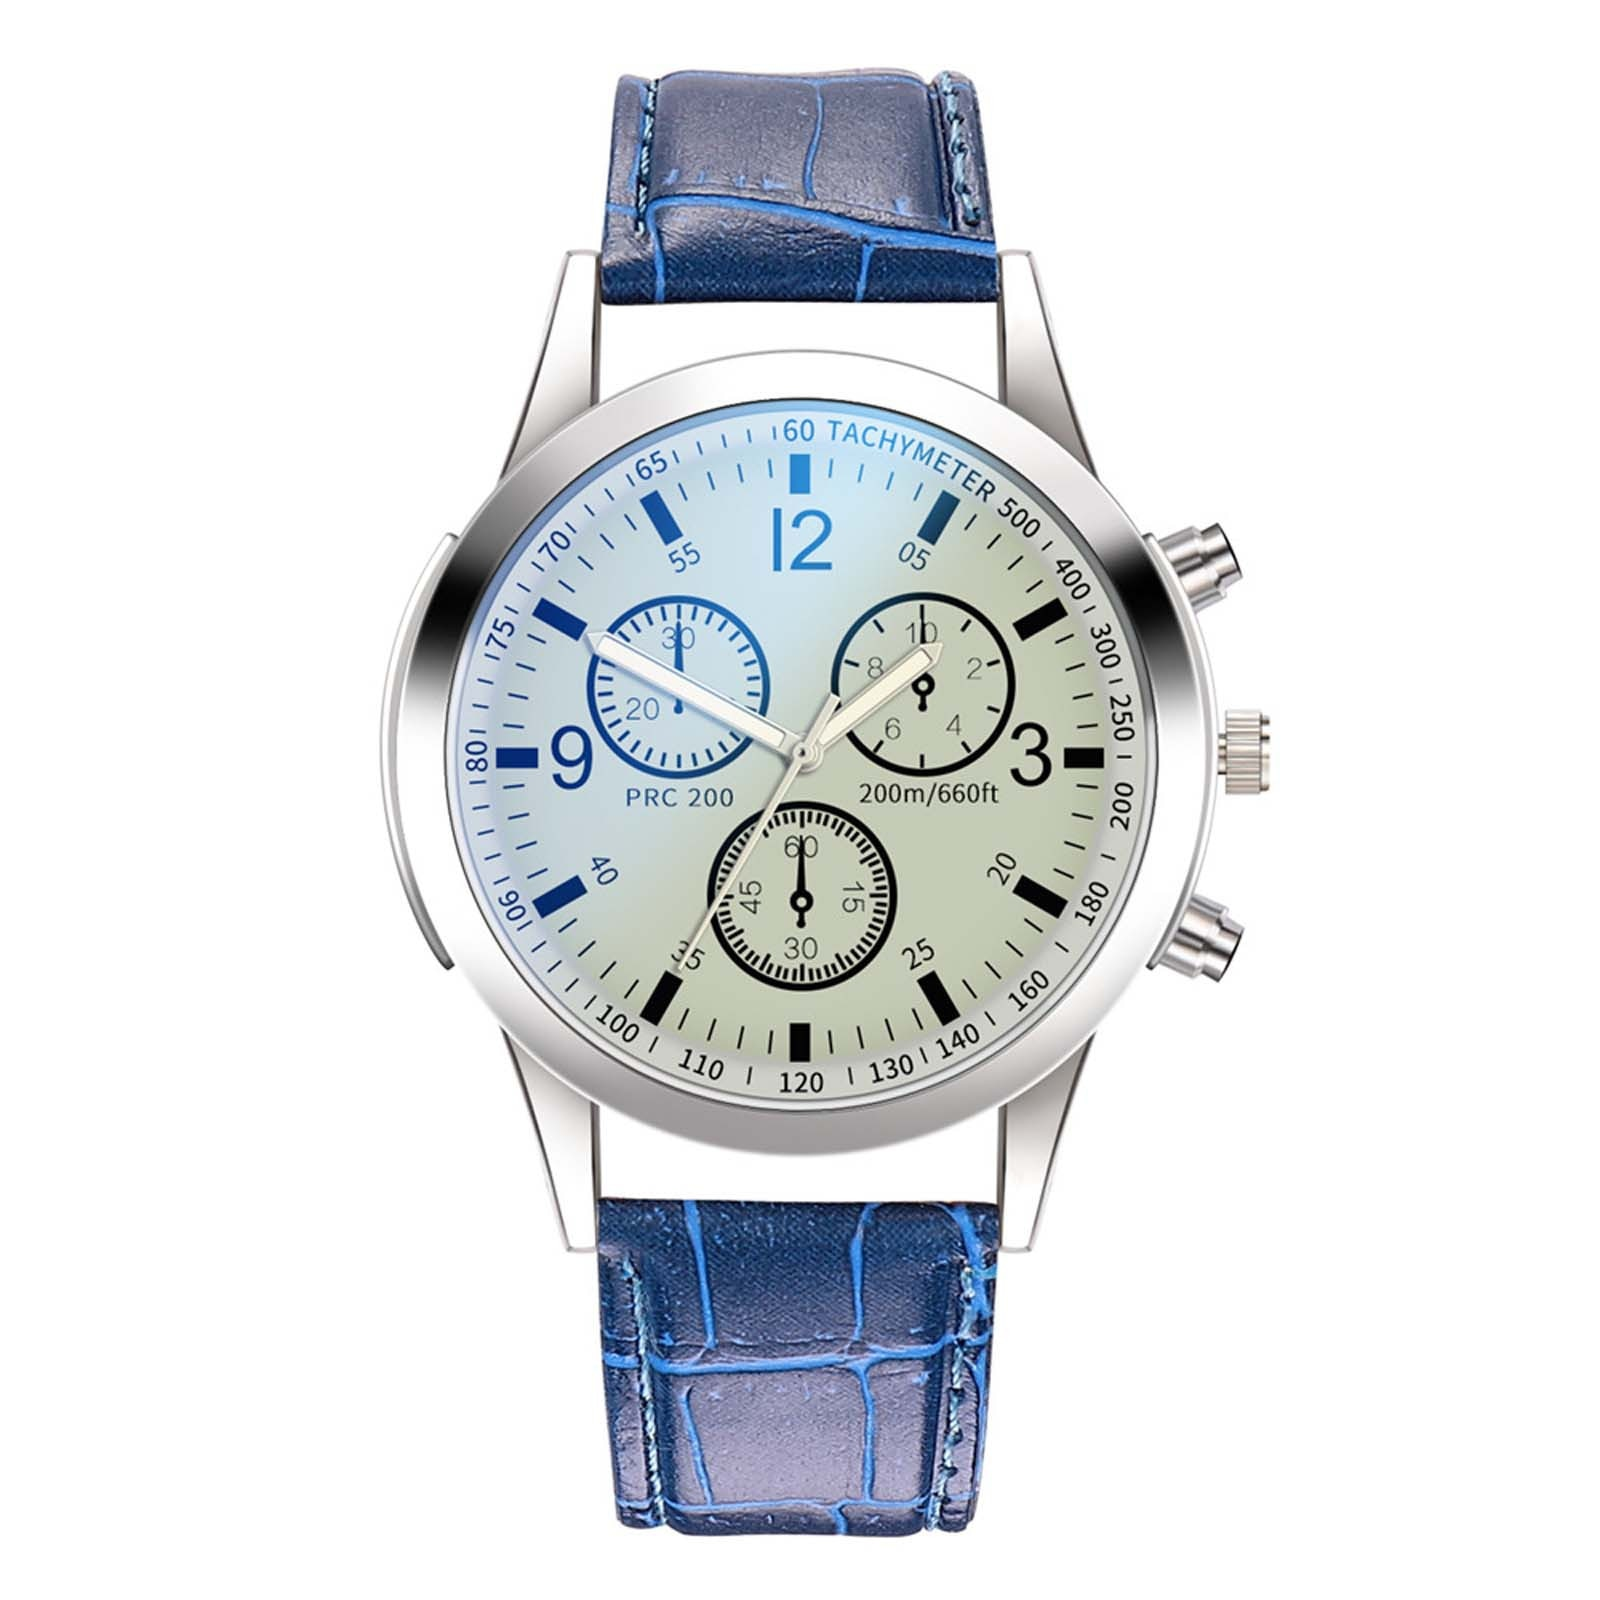 Men Quartz Wrist Watches Fashion Watches Quartz Clocks Leather Casual Business Wristwatches Hand Clo